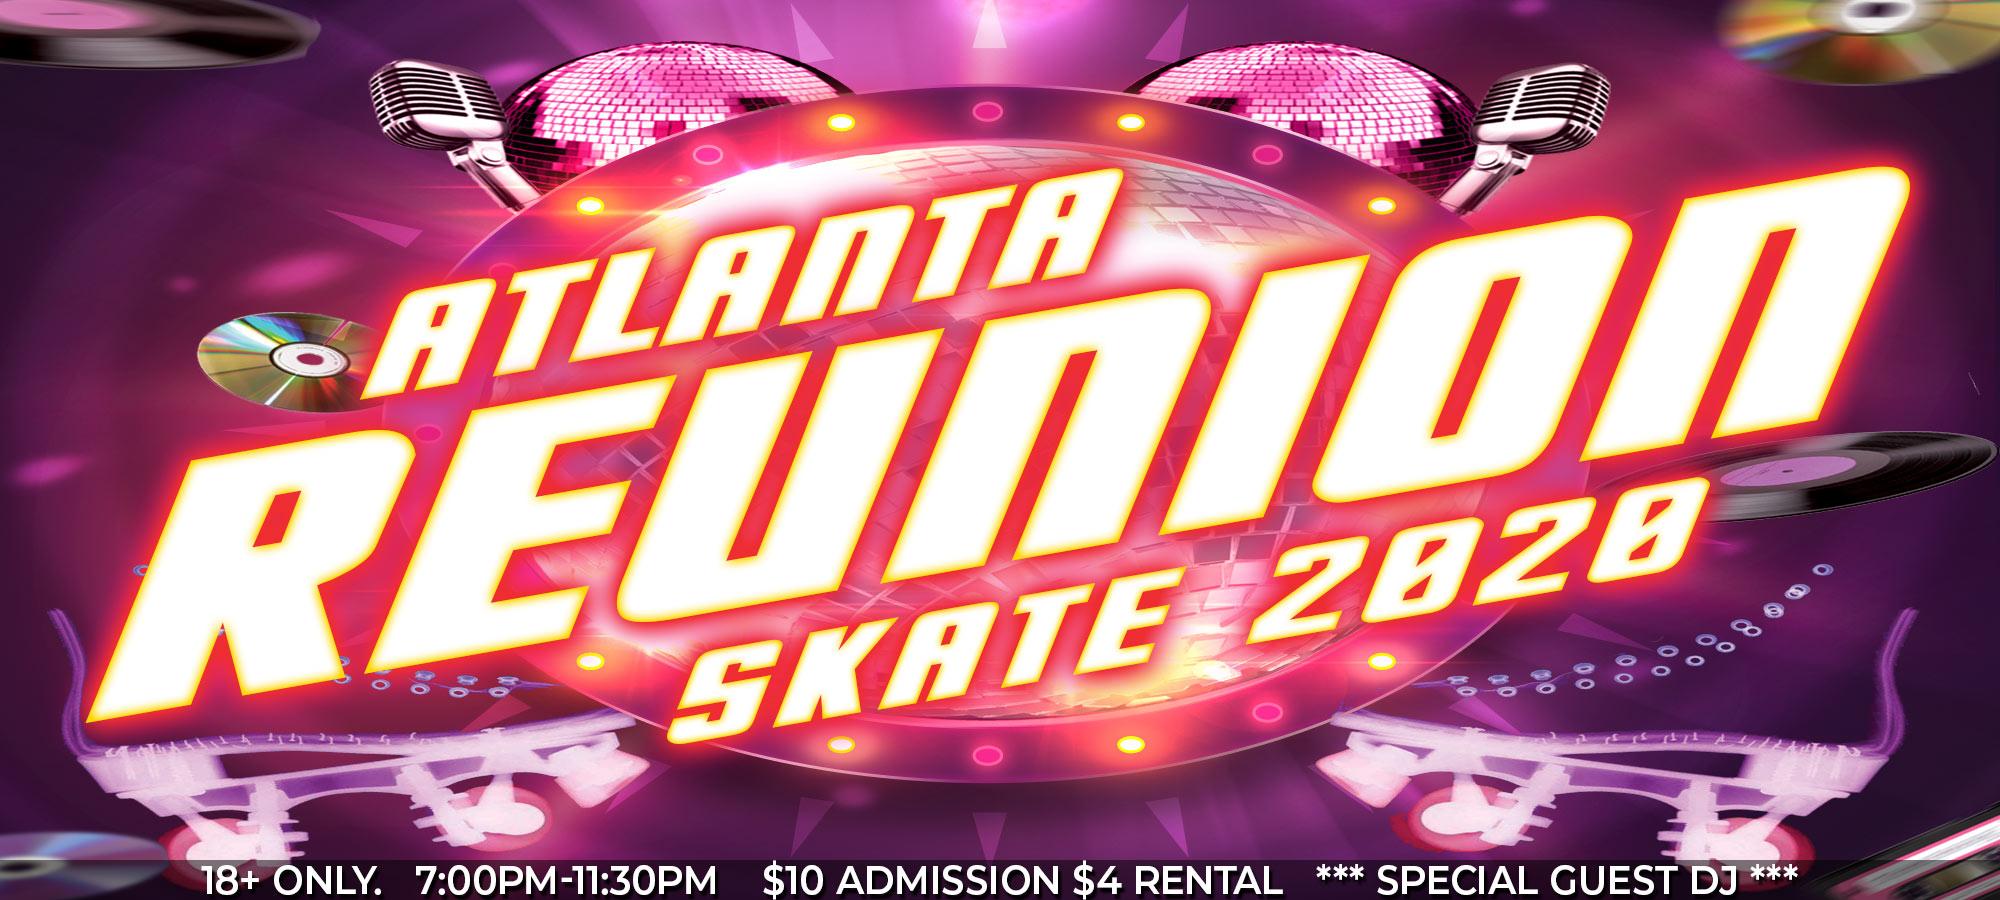 Atlanta-Reunion-Skate-2020